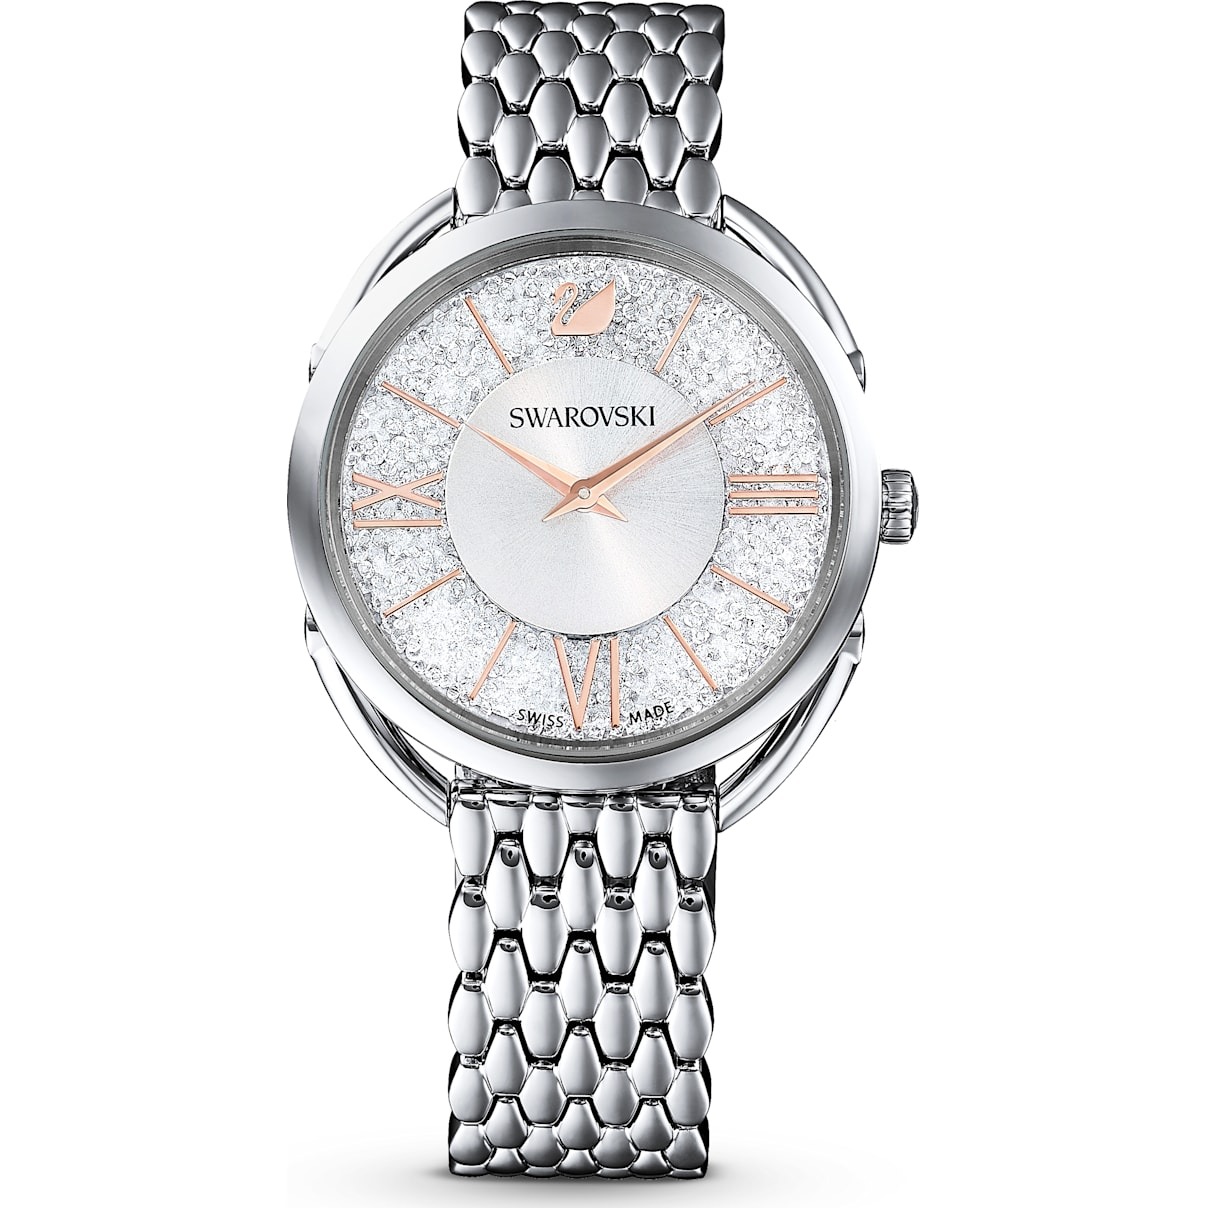 Swarovski Crystalline Glam Watch, Metal bracelet, White, Stainless steel